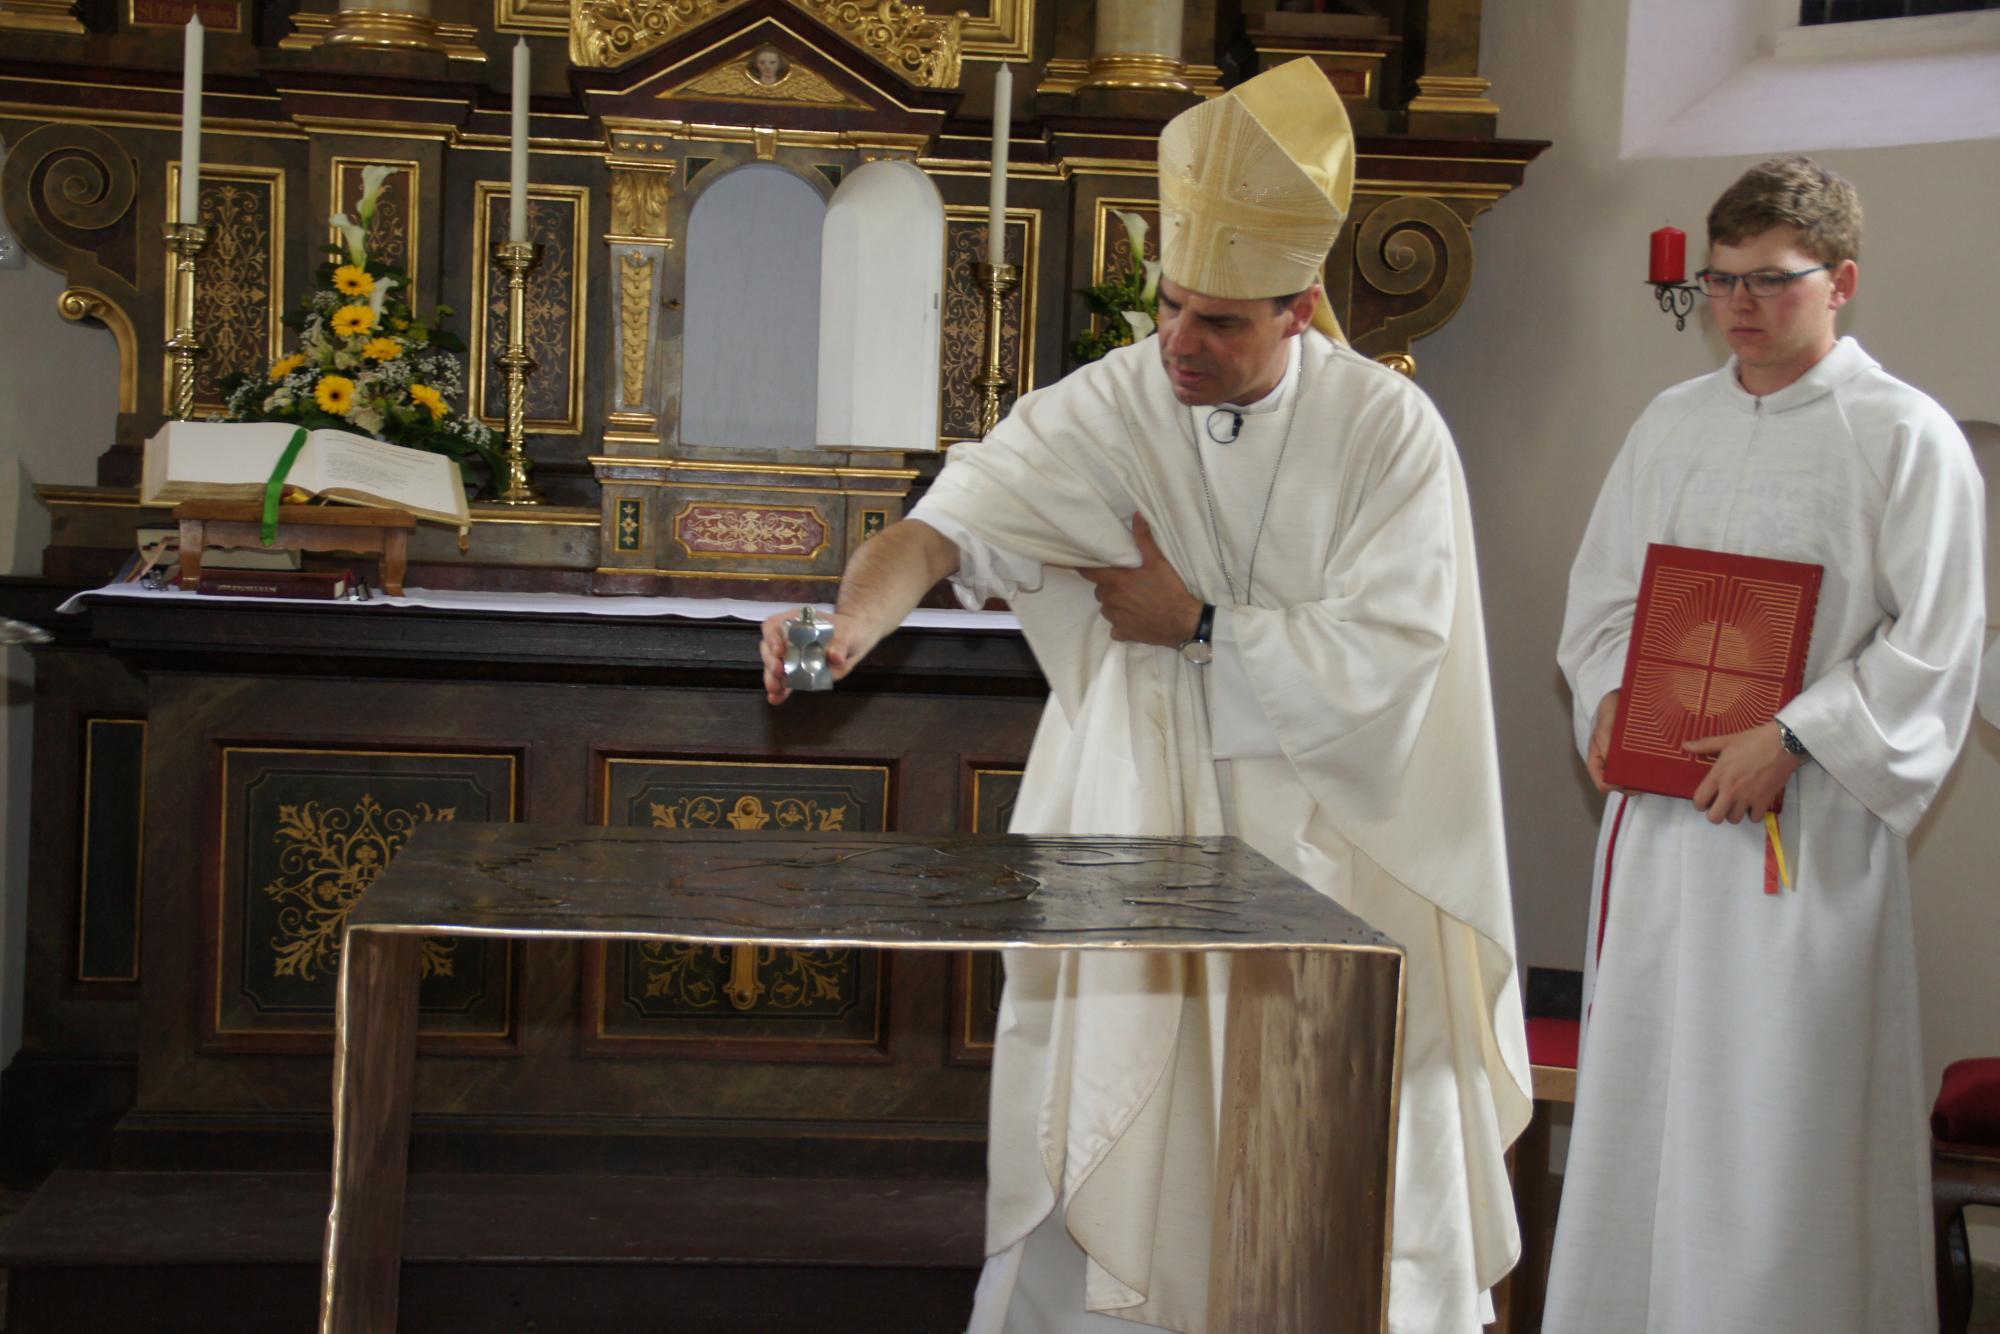 Altarweihe-Lengsham-DSC06298